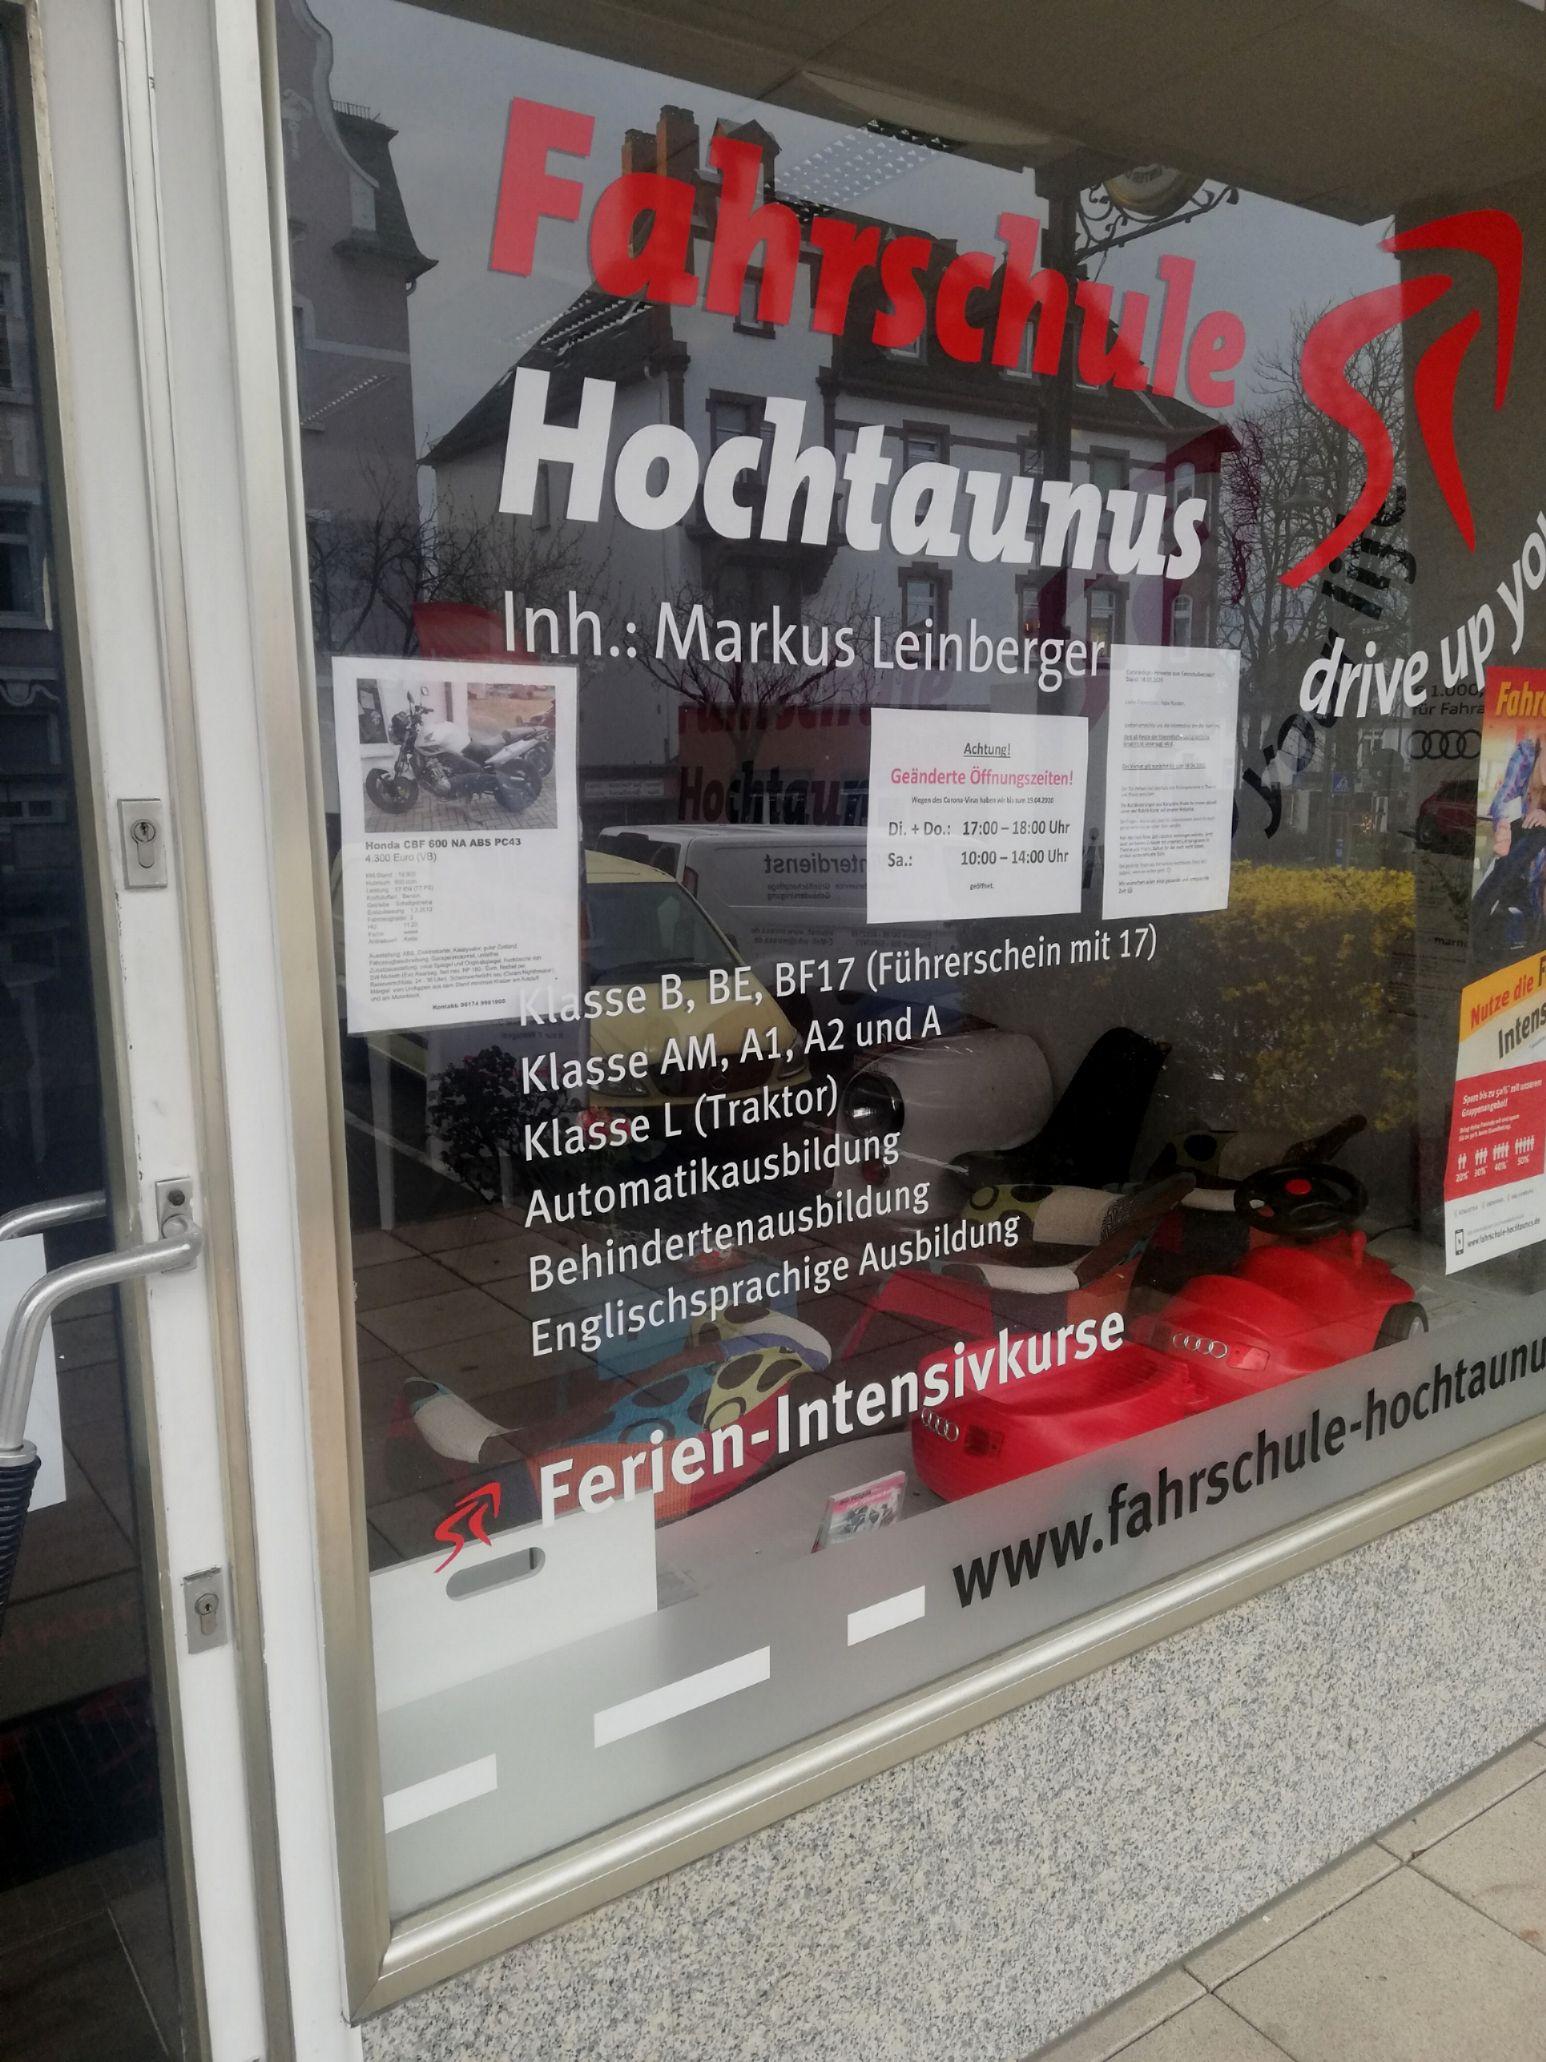 FAHRSCHULE HOCHTAUNUS Inh.: Markus Leinberger